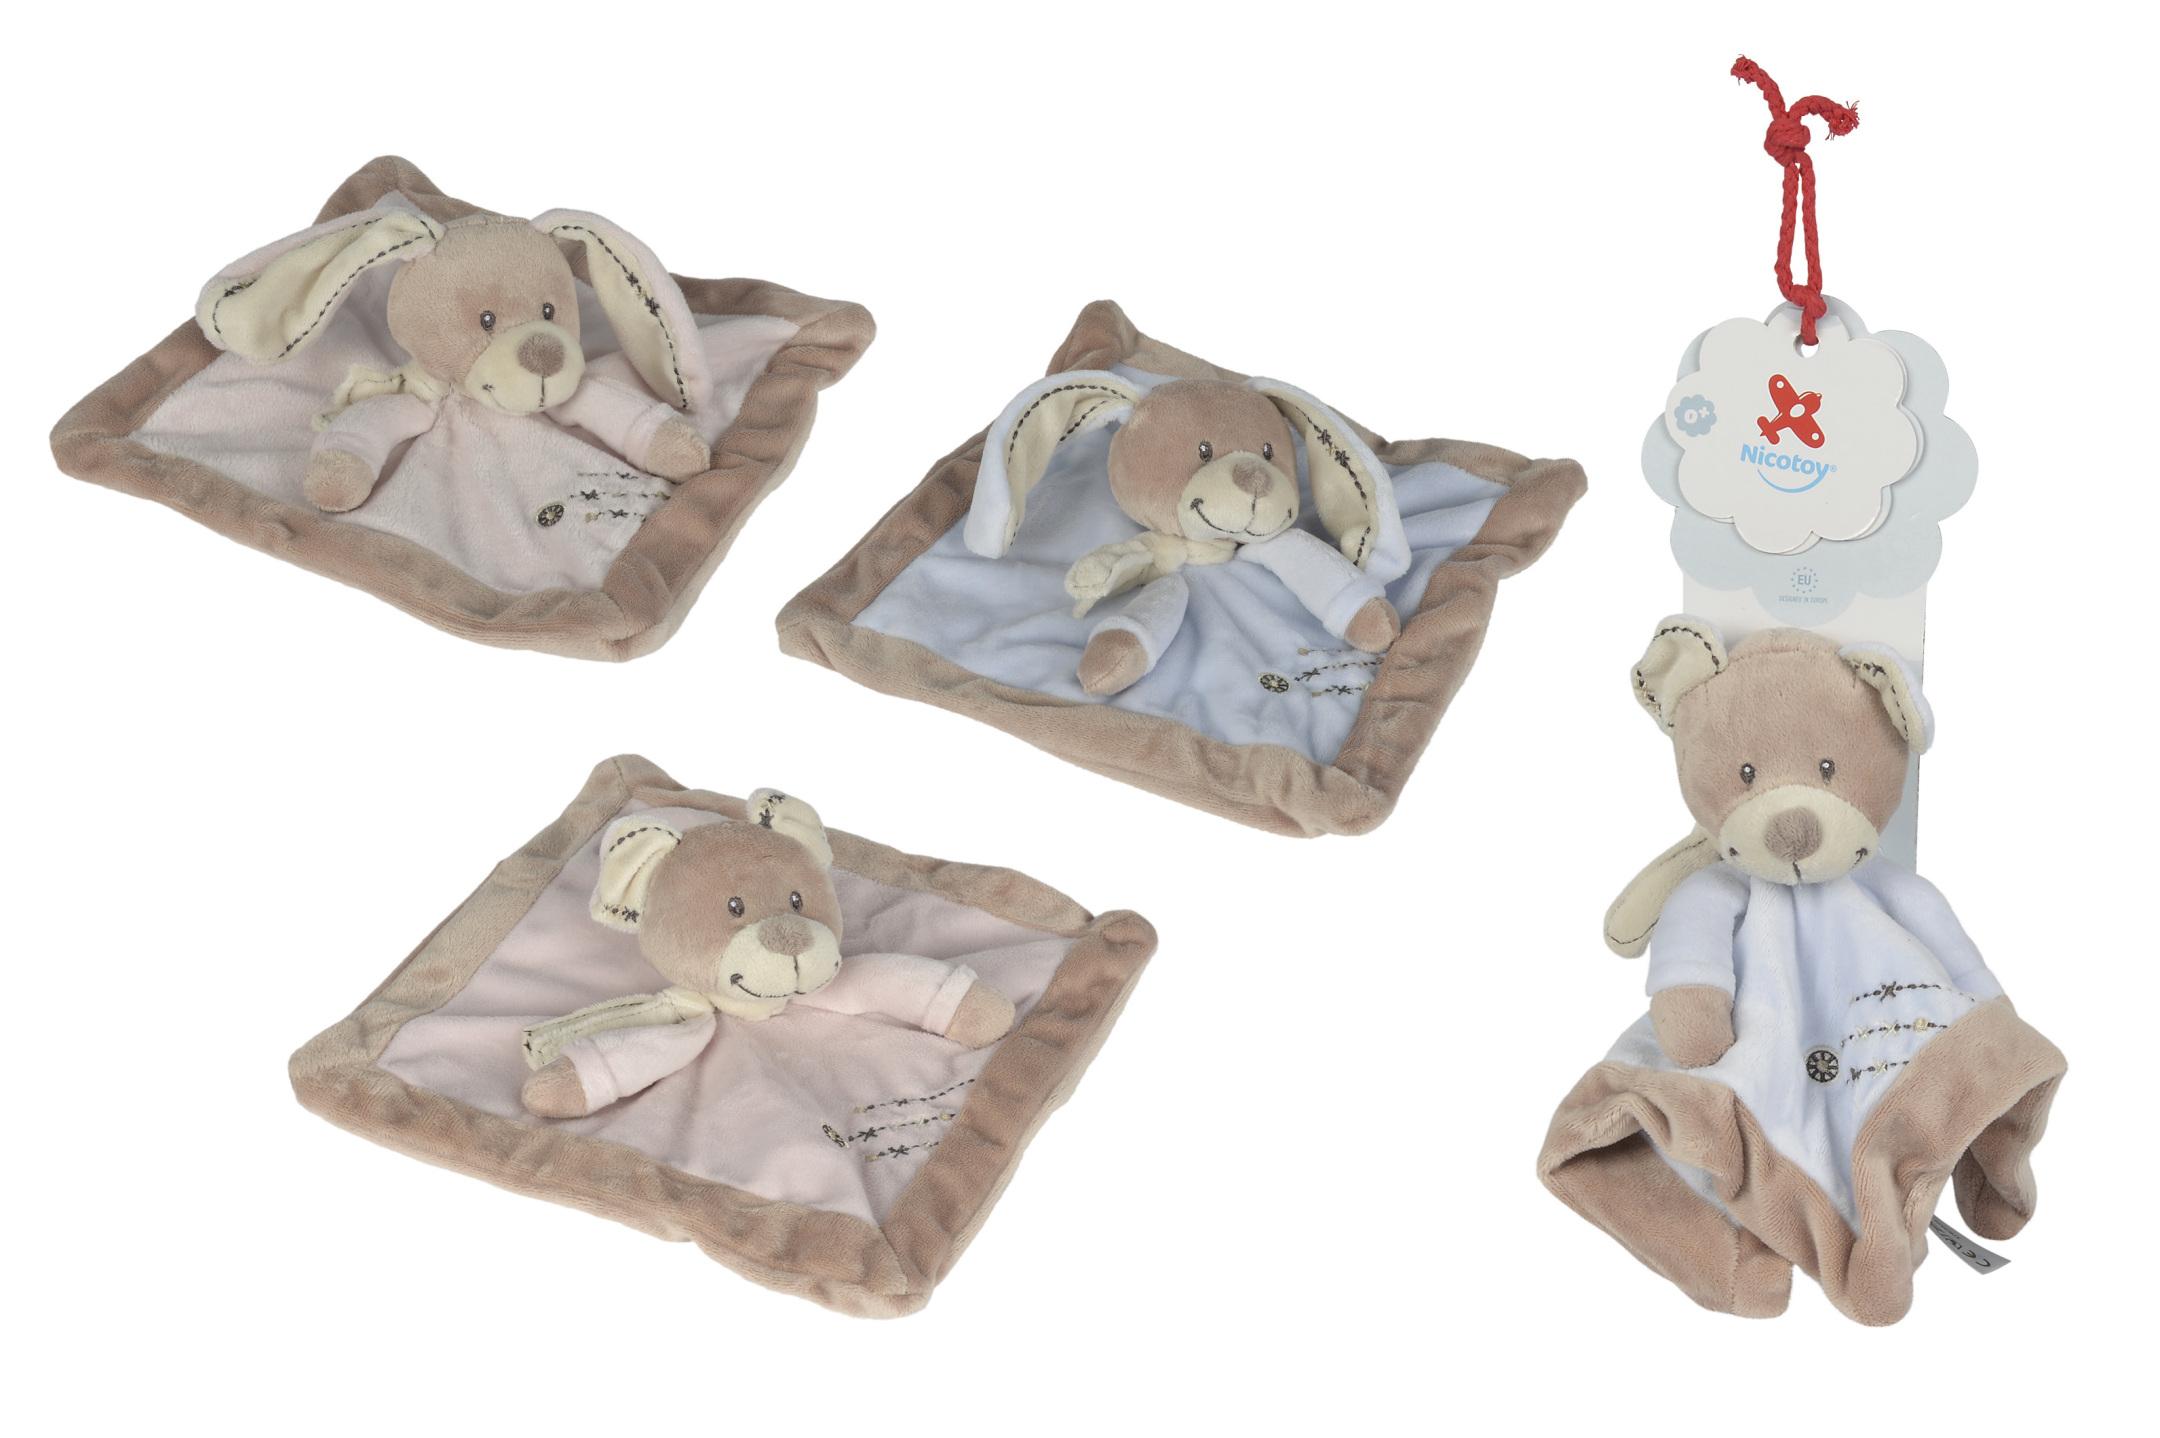 Nicotoy Baby Schmusetuch Cuddles 4fs